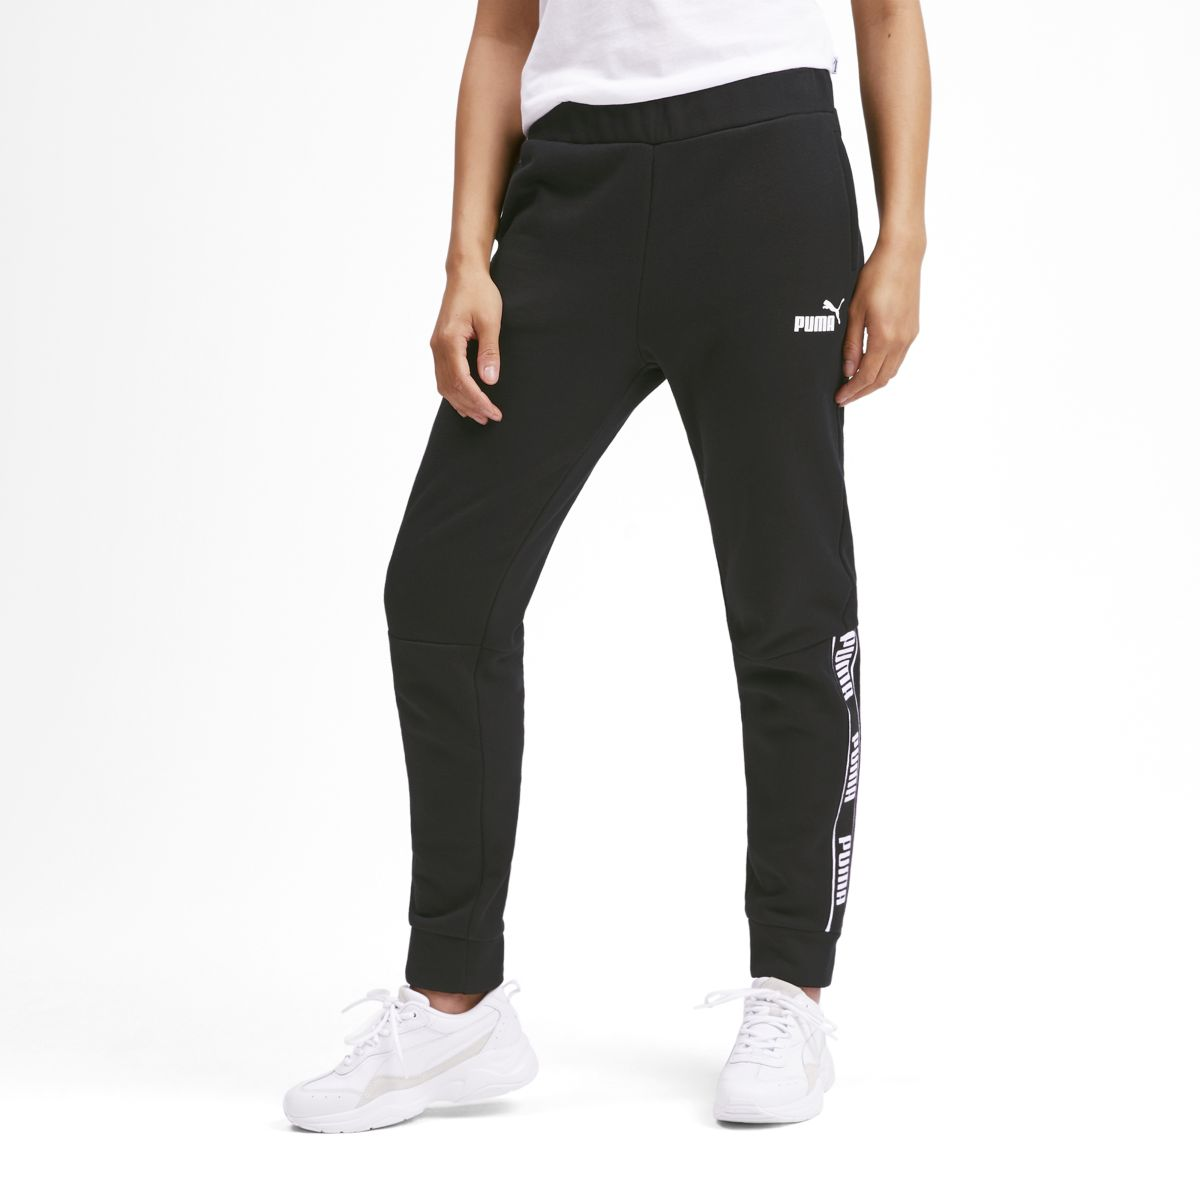 Брюки PUMA Amplified Pants Fl брюки puma amplified sweat pants